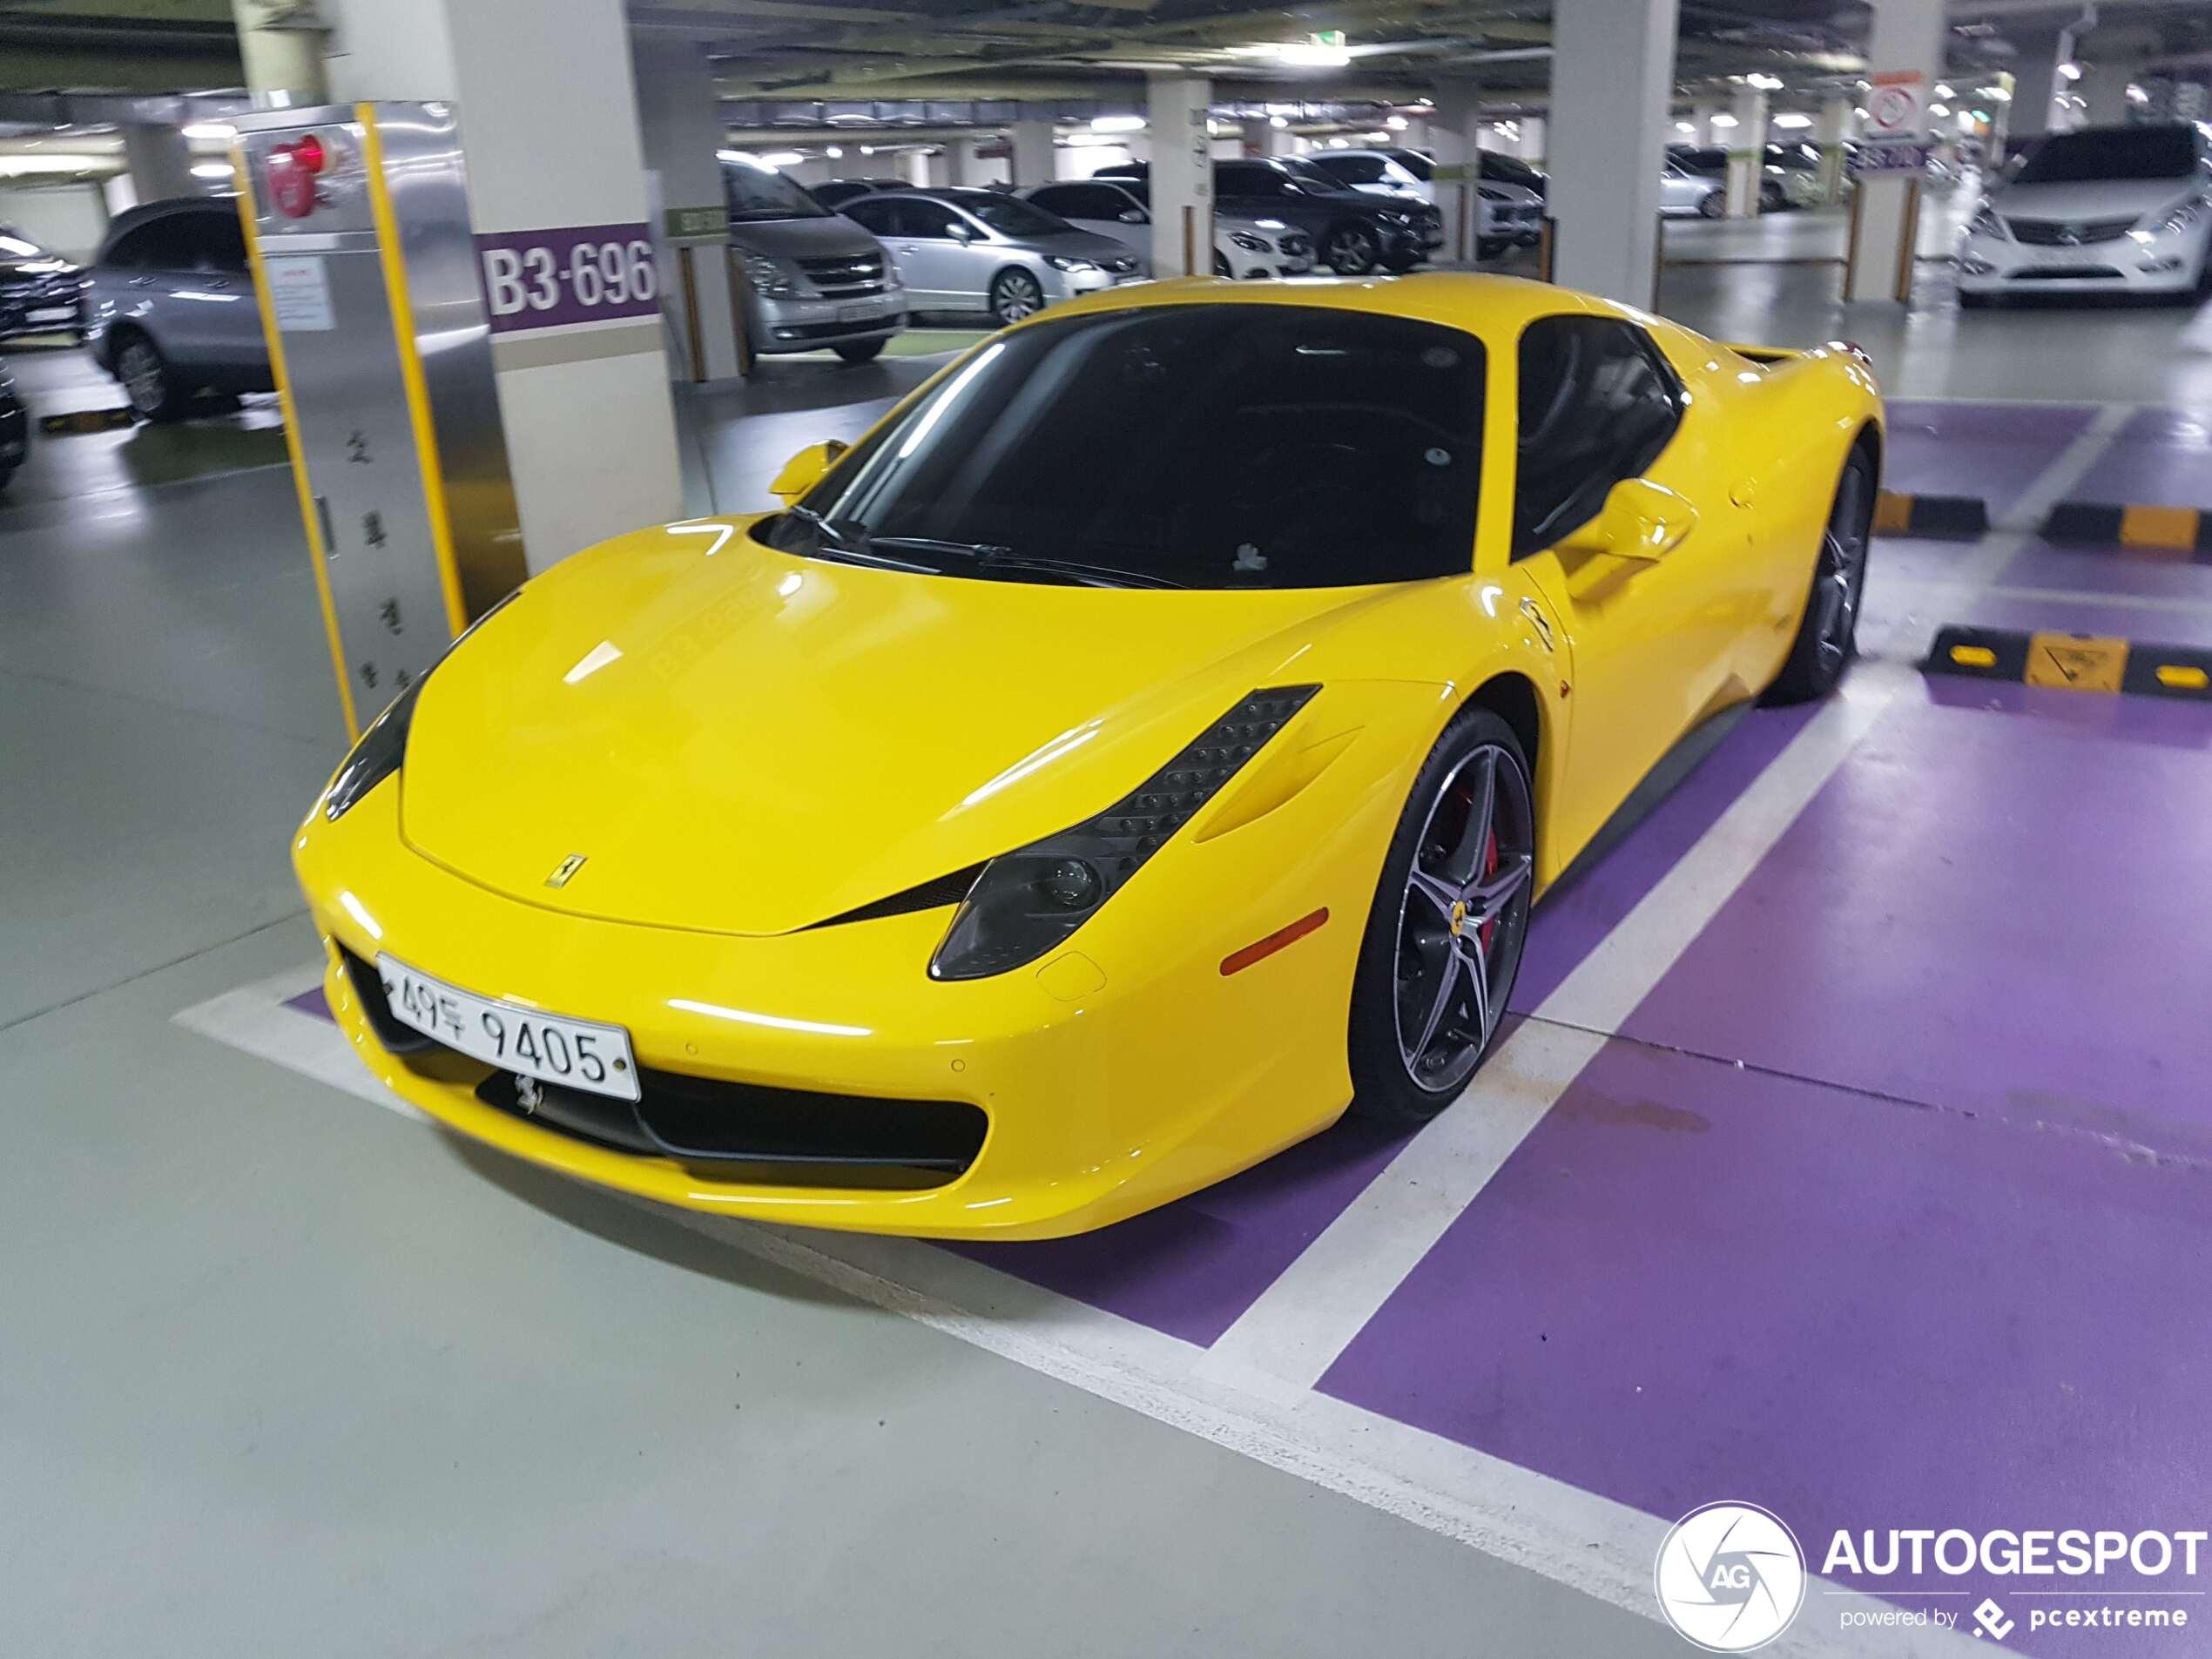 Ferrari 458 Spider - 12 January 2020 - Autogespot